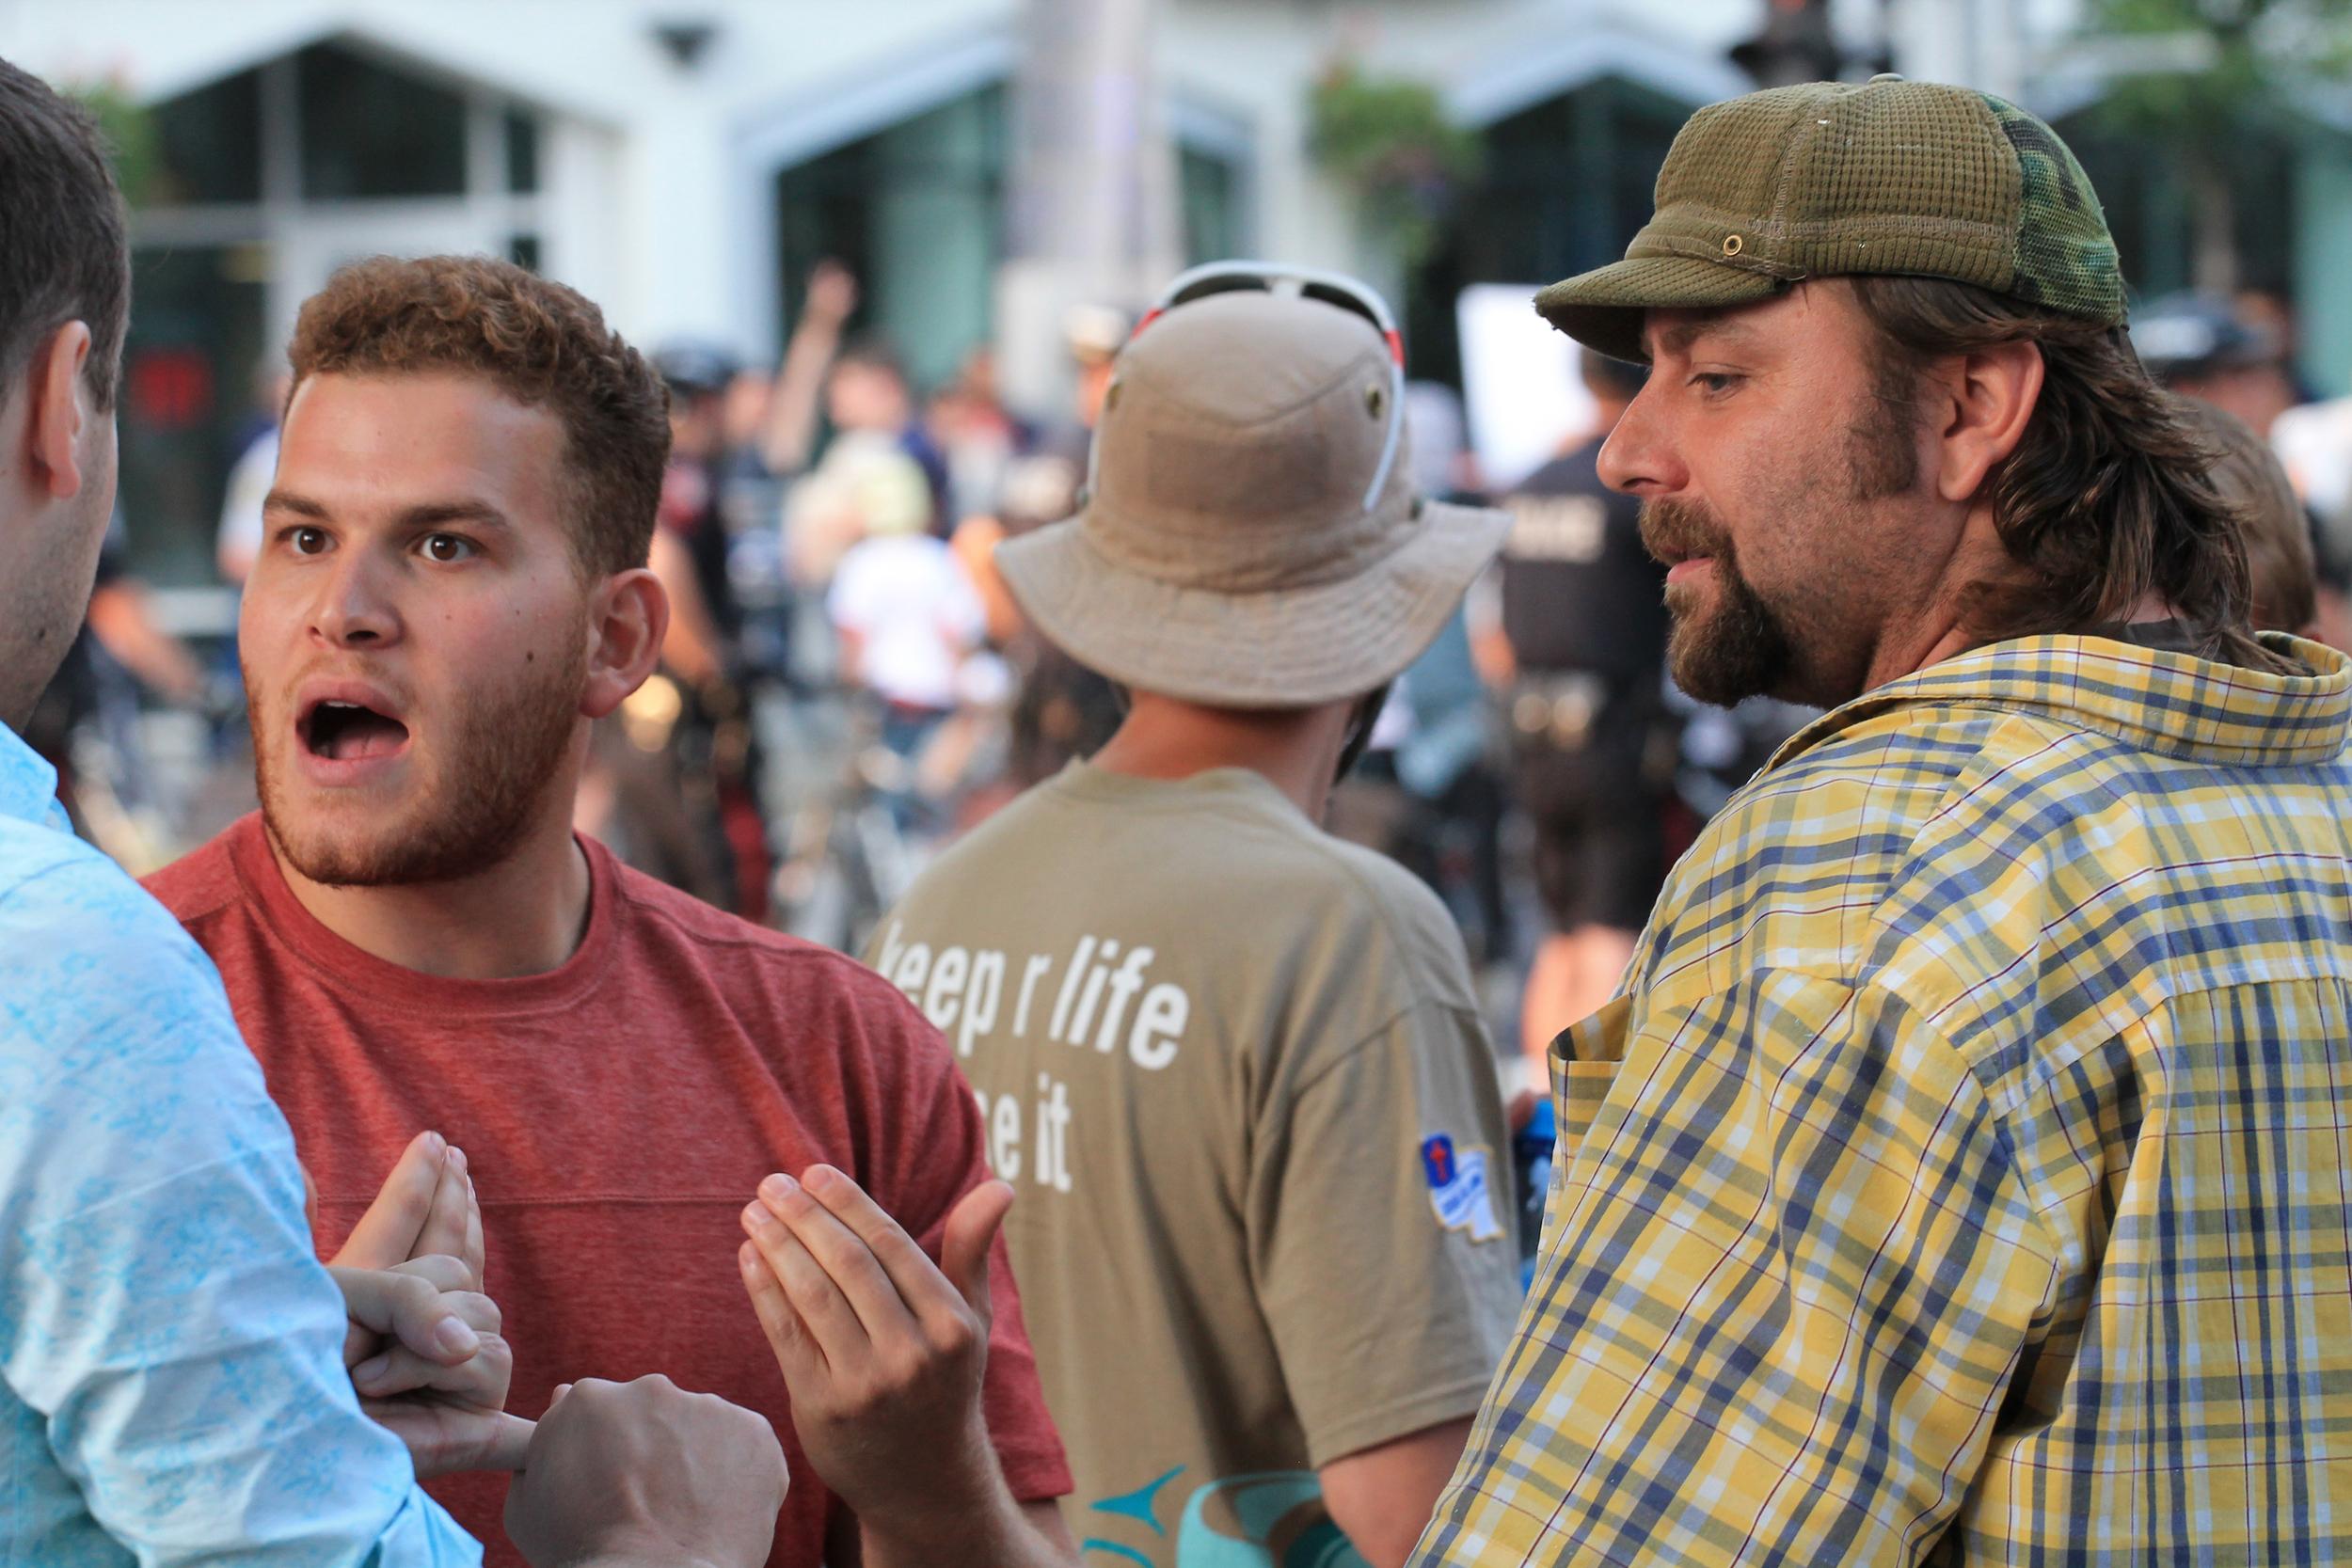 HeathCoxi-Protest- July 18 2014-0637.jpg